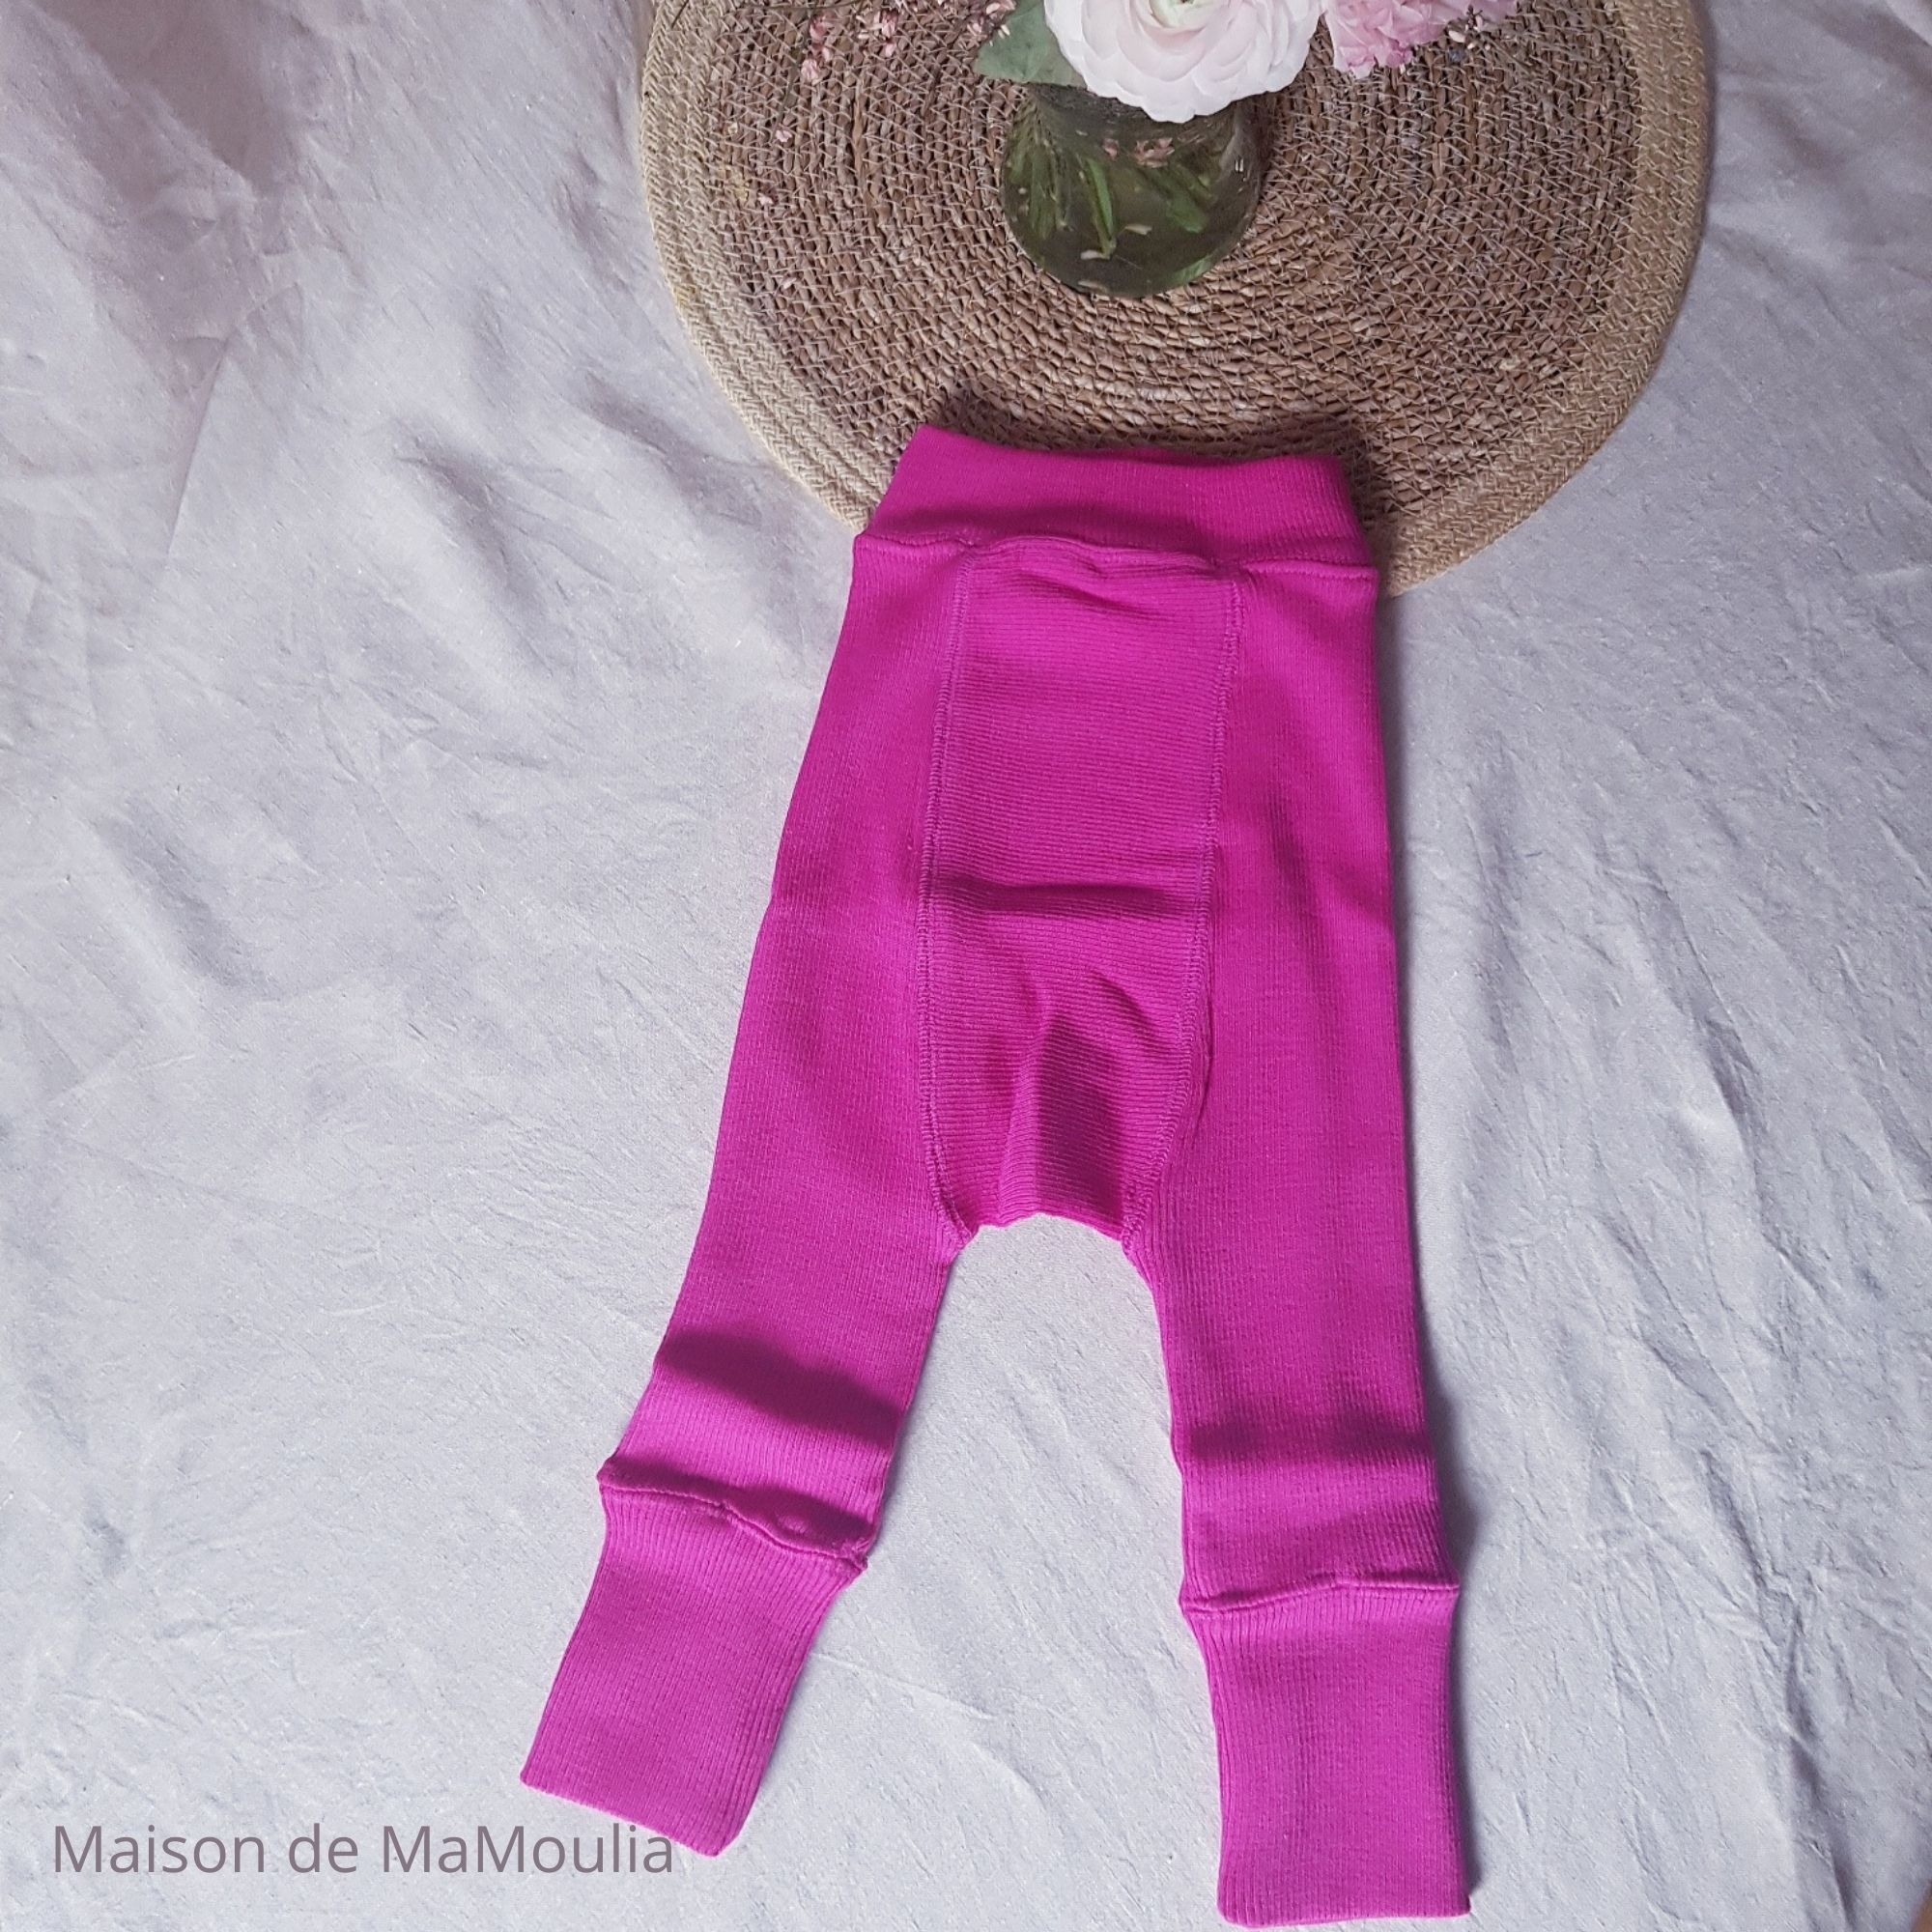 MANYMONTHS - LONGIES Pantalon Évolutif - 100% laine mérinos - Réversible - LILAC/LOTUS